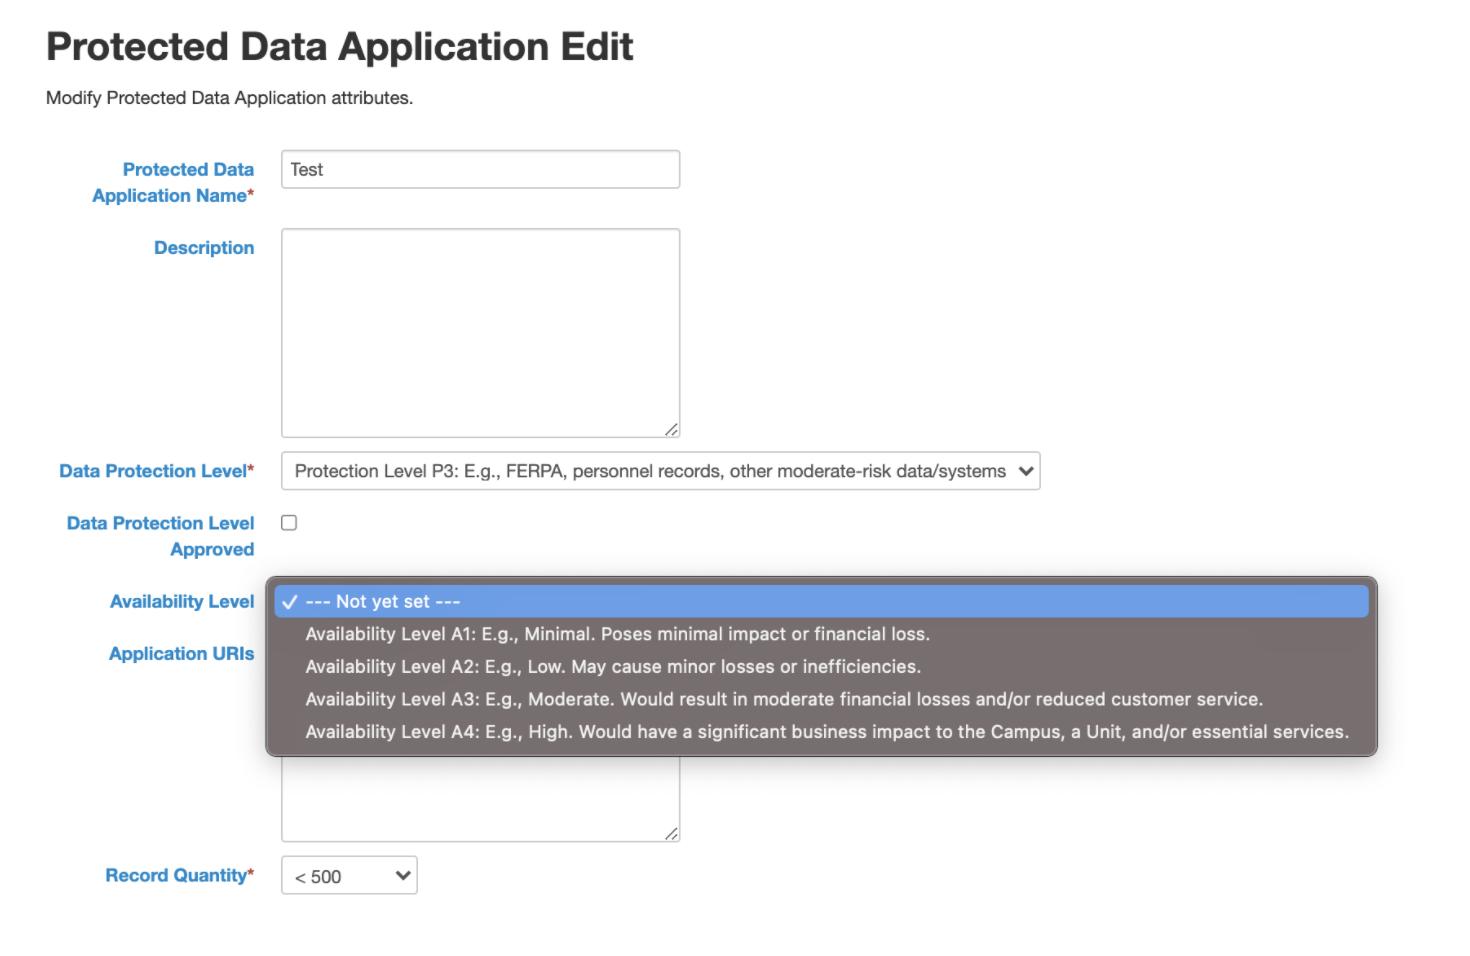 Protected Data Application Edit